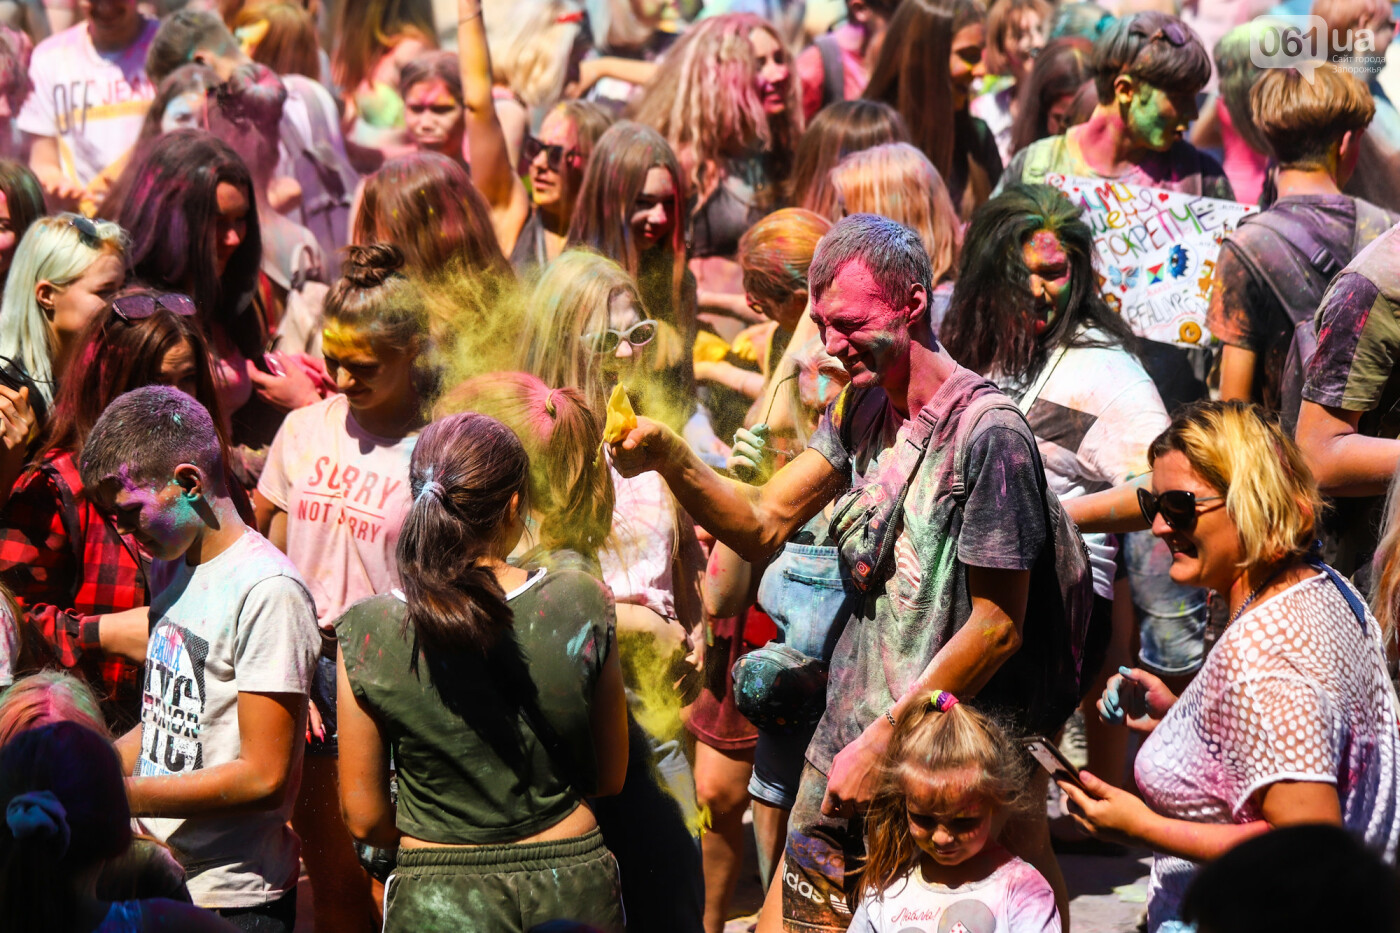 Сотни запорожцев приняли участие в фестивале красок Холи, - ФОТОРЕПОРТАЖ, фото-19